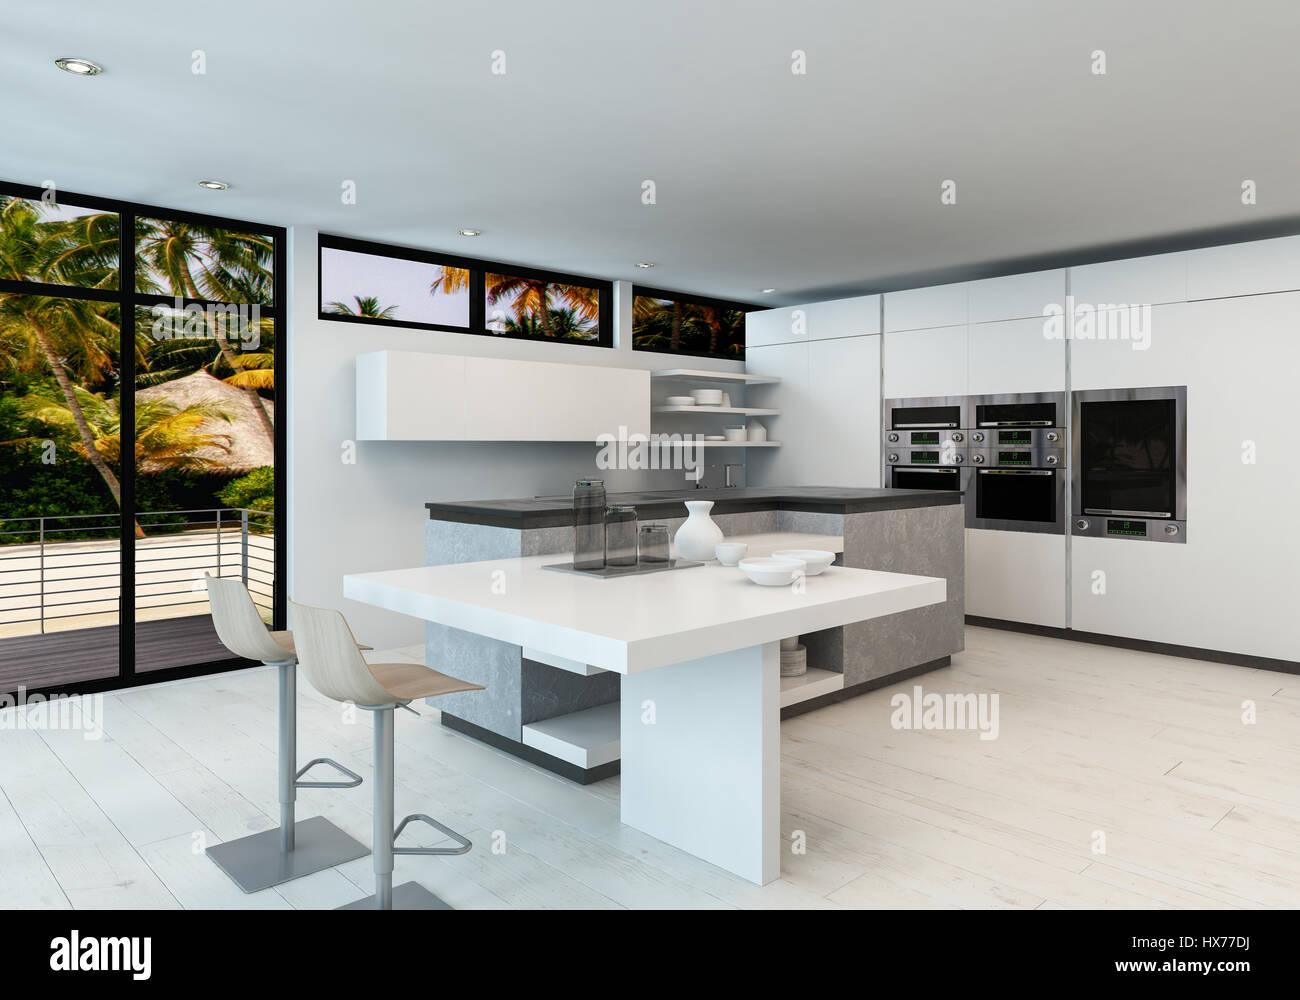 Bancone bar cucina for Bancone con angolo